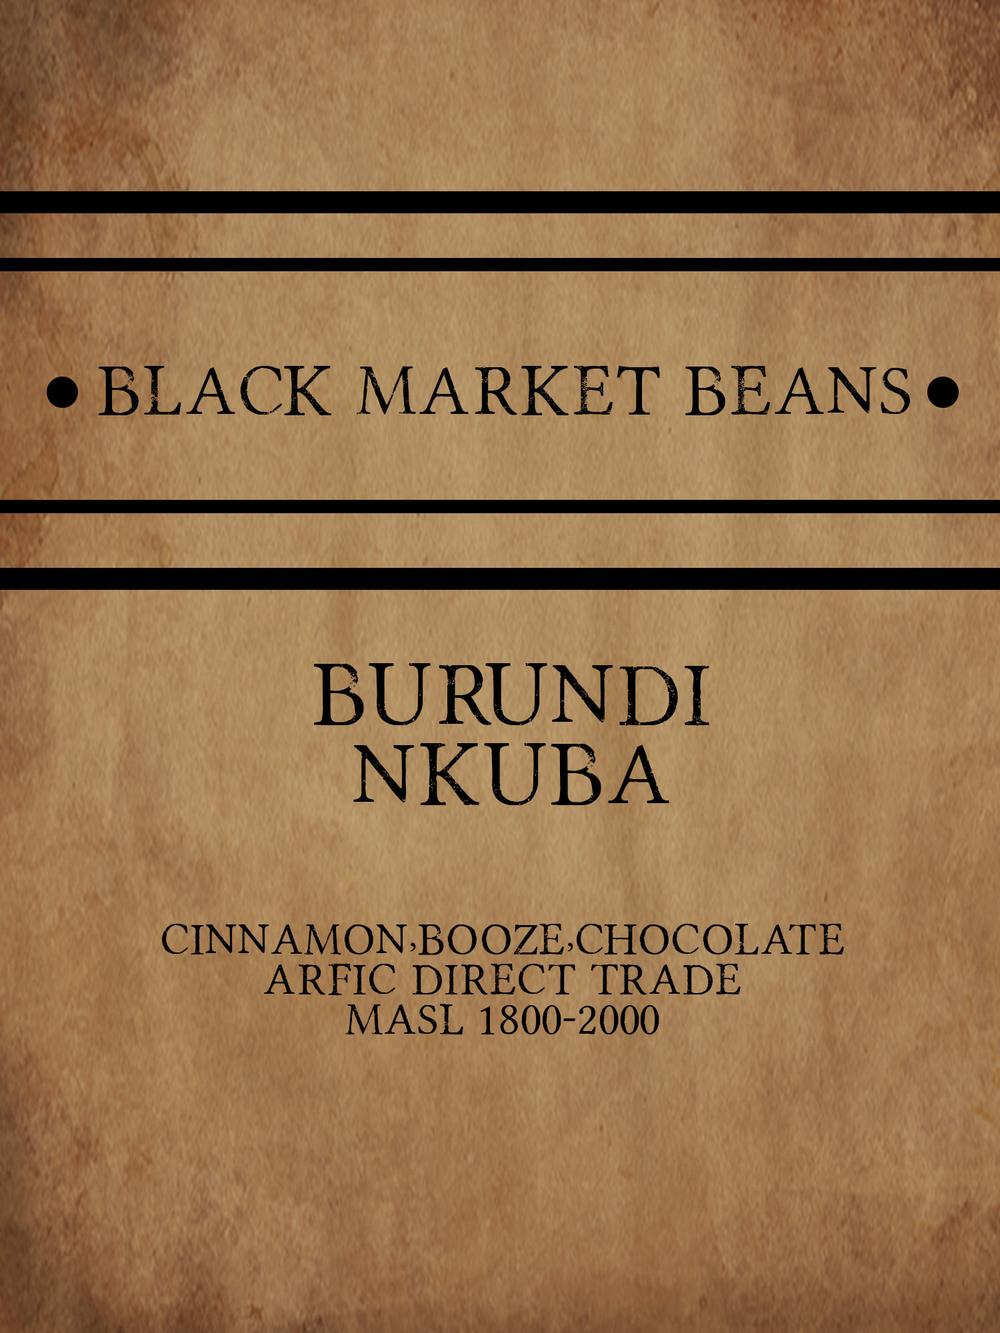 coffee_Burundi_Nkuba.jpg